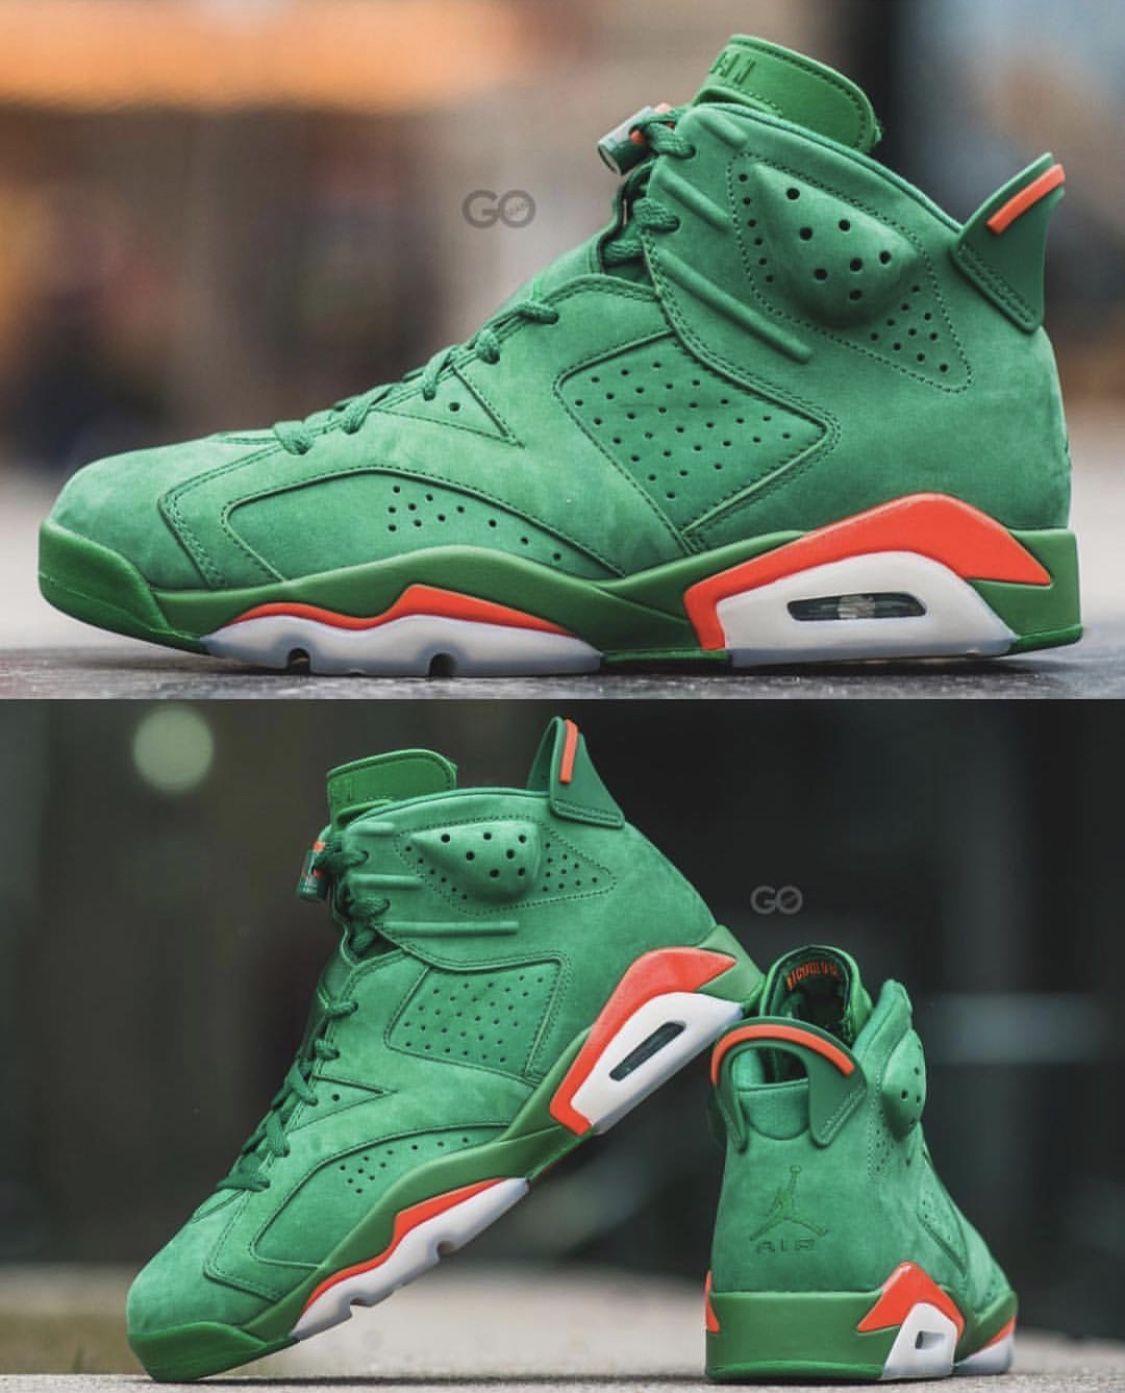 fe645f0d717 Air Jordan 6 Gatorade | got style | Hype shoes, Shoes, Air jordans